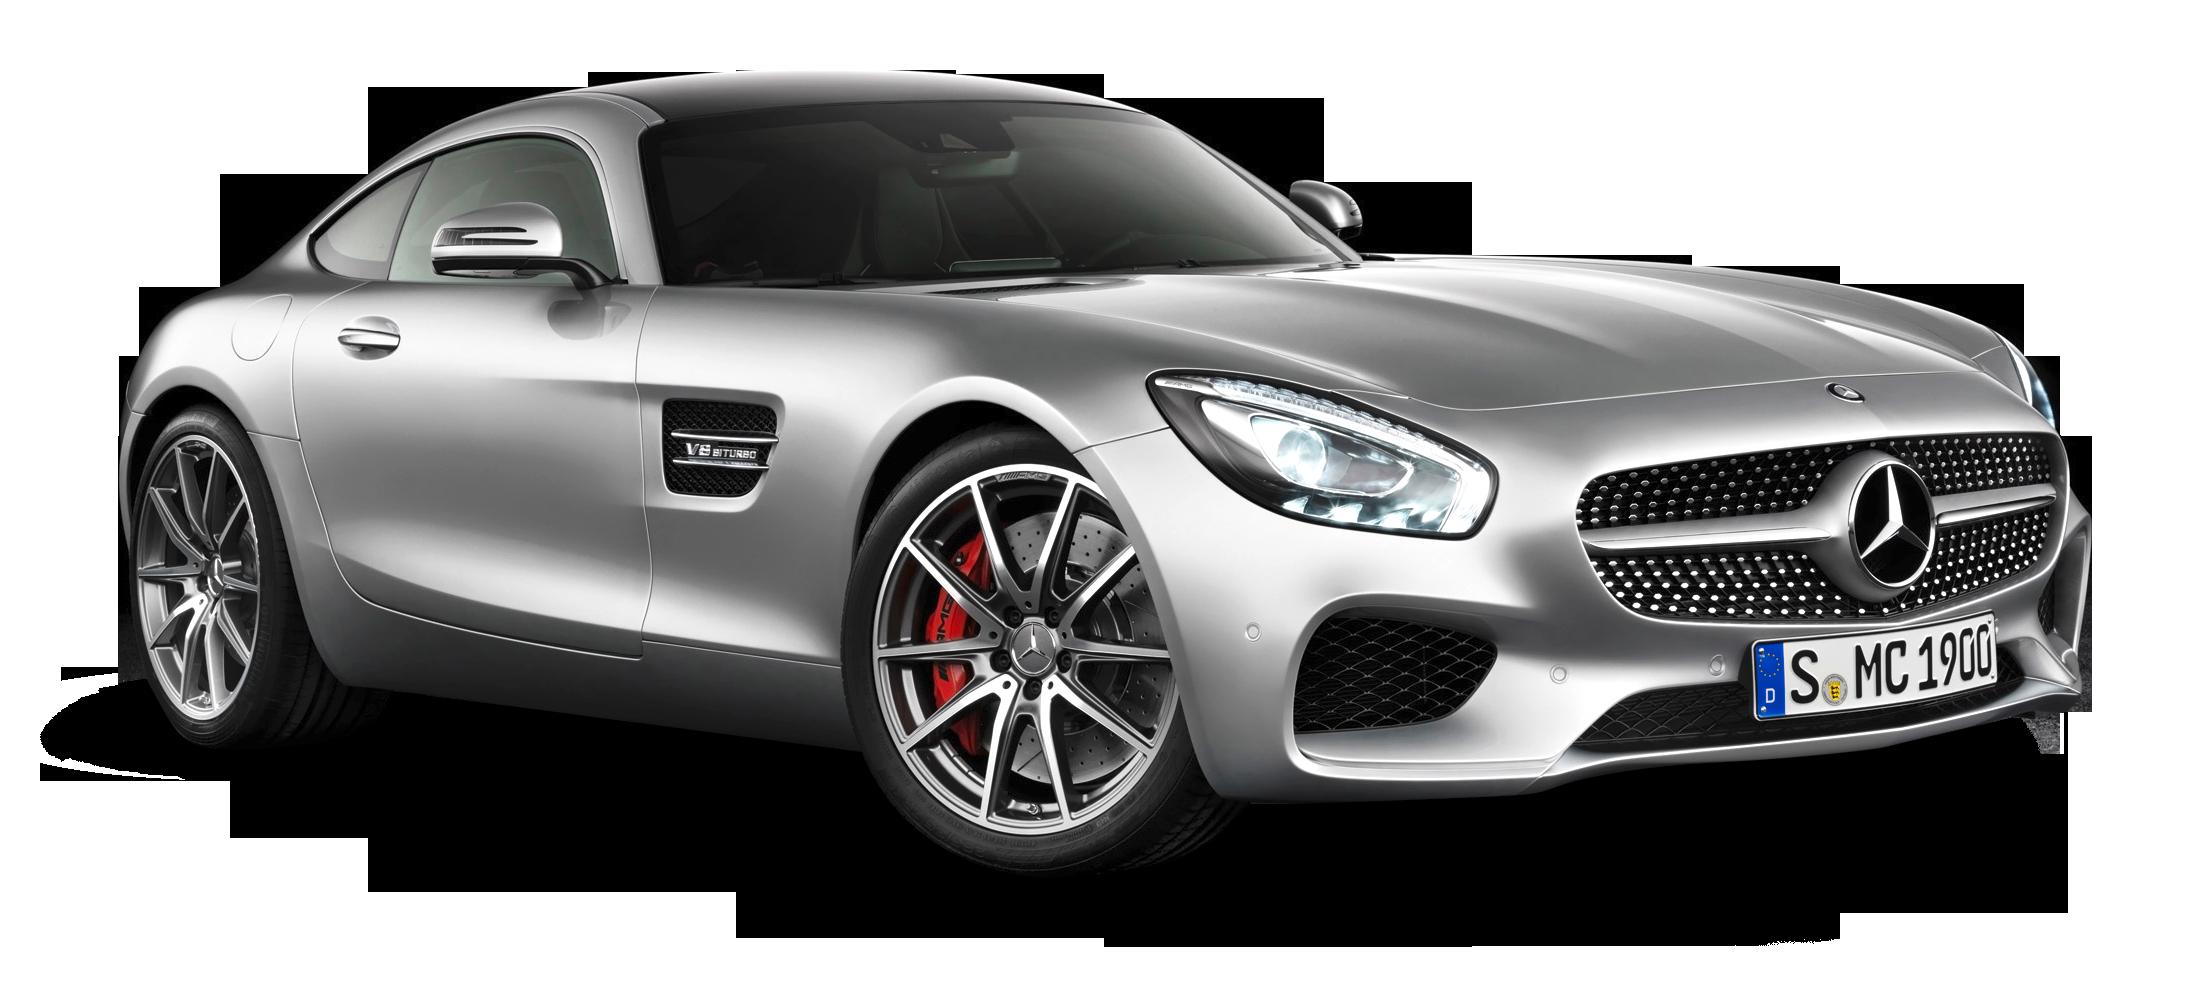 Amg clipart png transparent 2016 Mercedes-Benz AMG GT Car Mercedes-Benz SLS AMG - Mercedes AMG ... png transparent